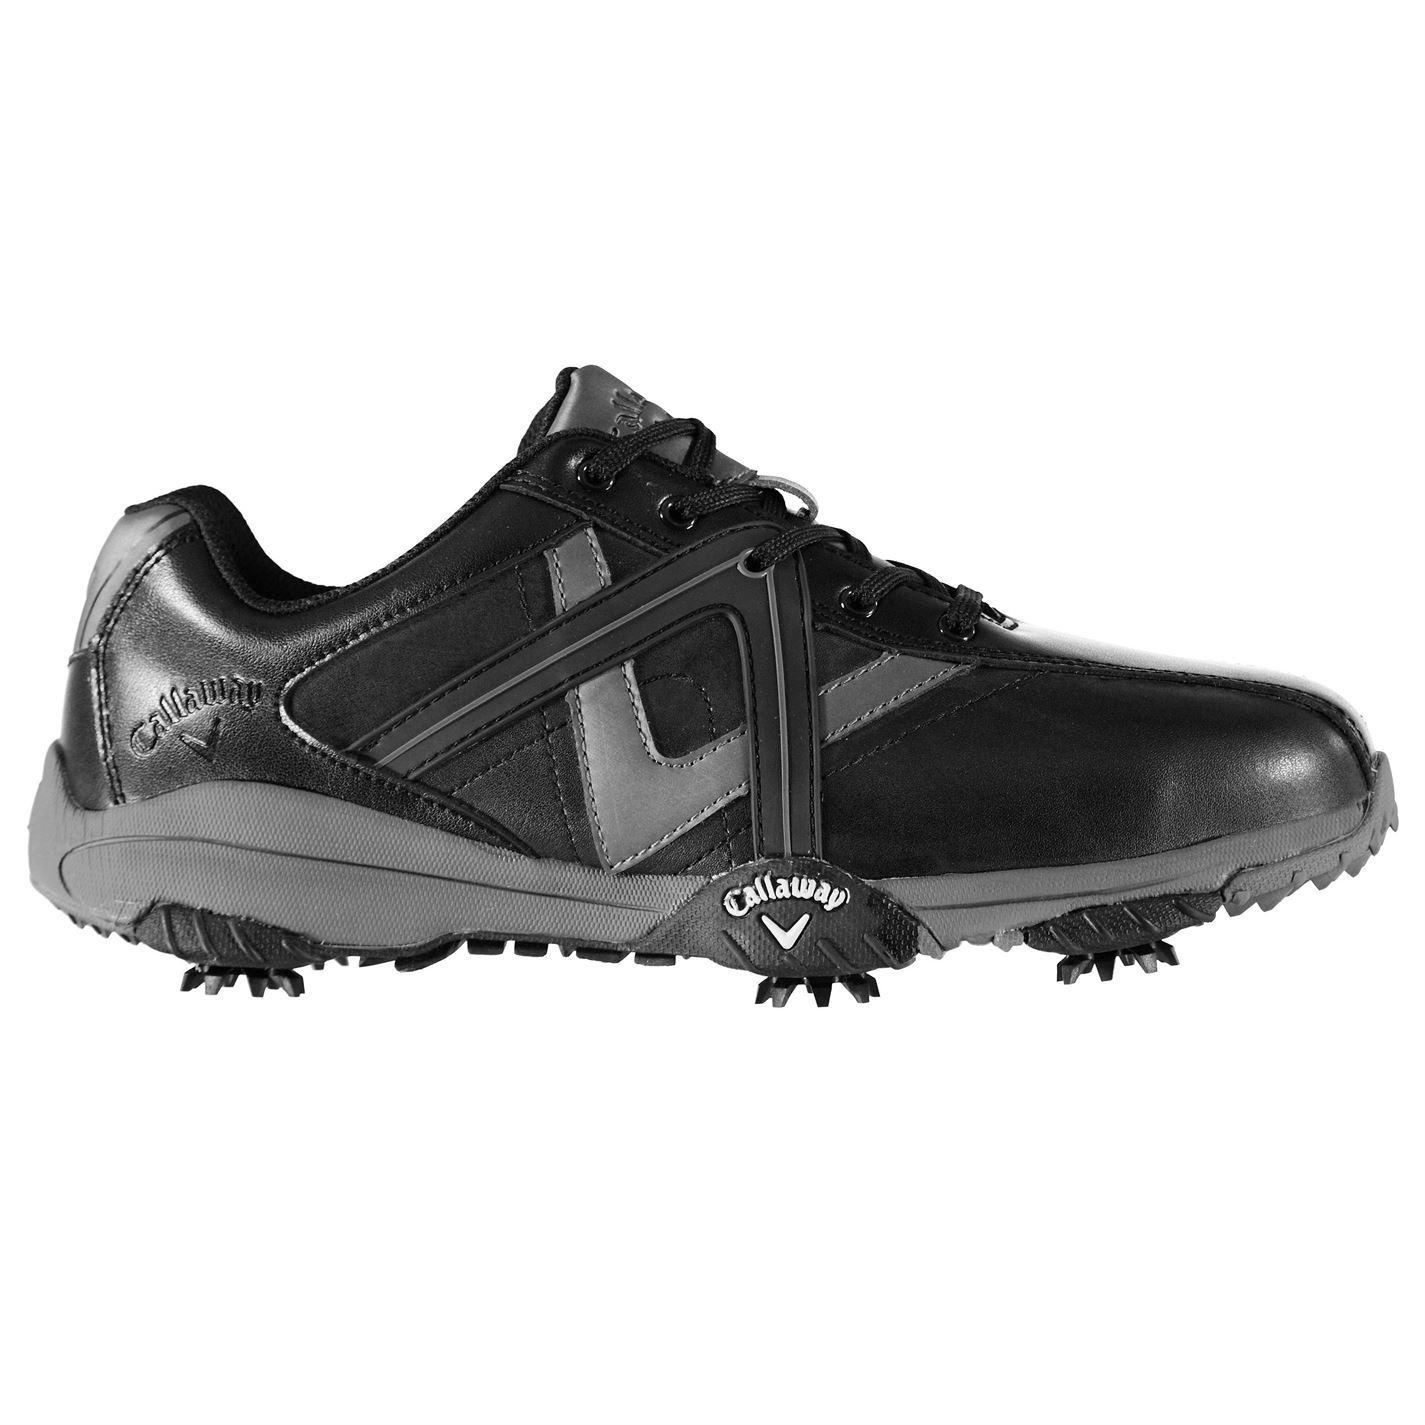 Callaway-Cheviot-ll-Golf-Shoes-Mens-Spikes-Footwear thumbnail 4